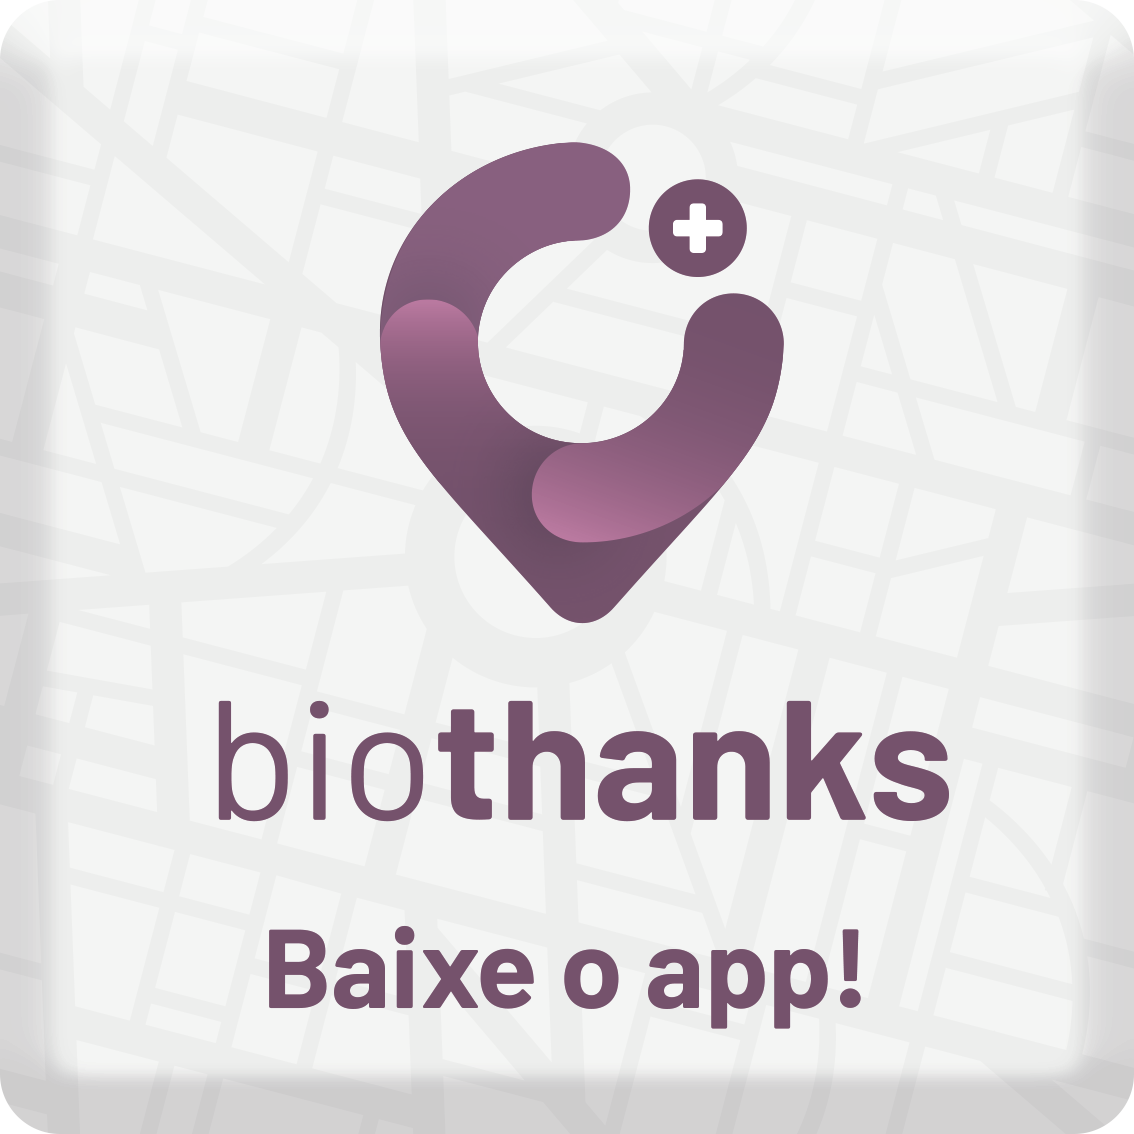 Biothanks